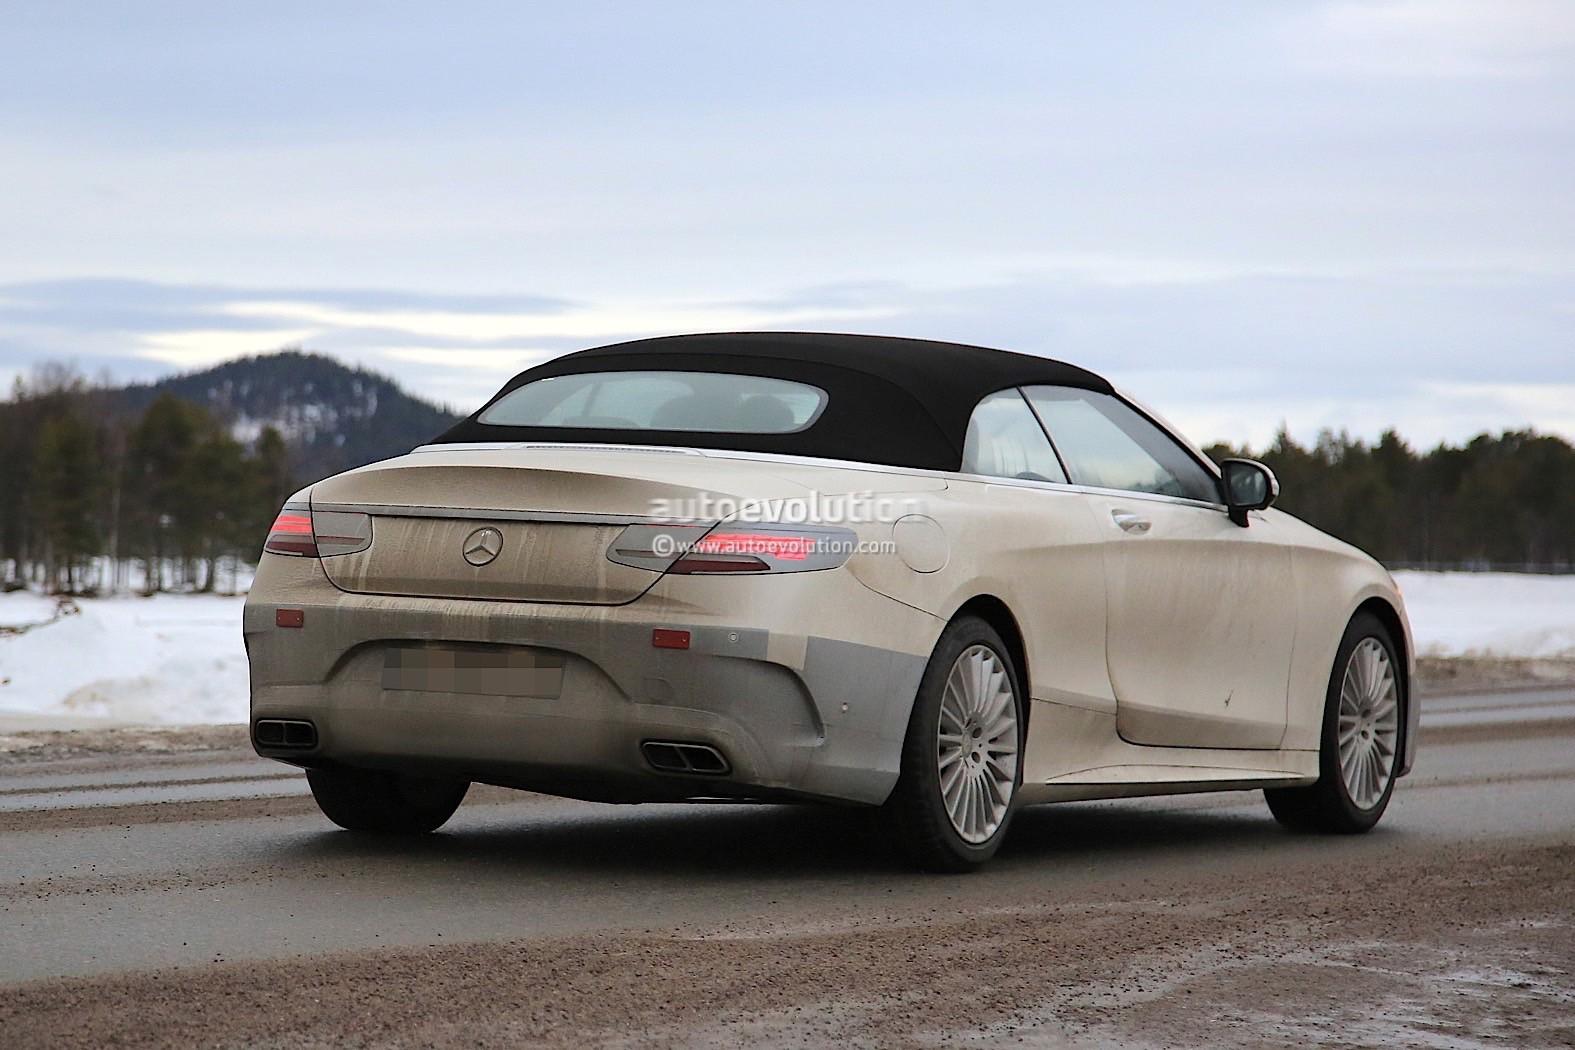 2019 Mercedes-Benz S-Class Cabriolet Begins Road Testing ...